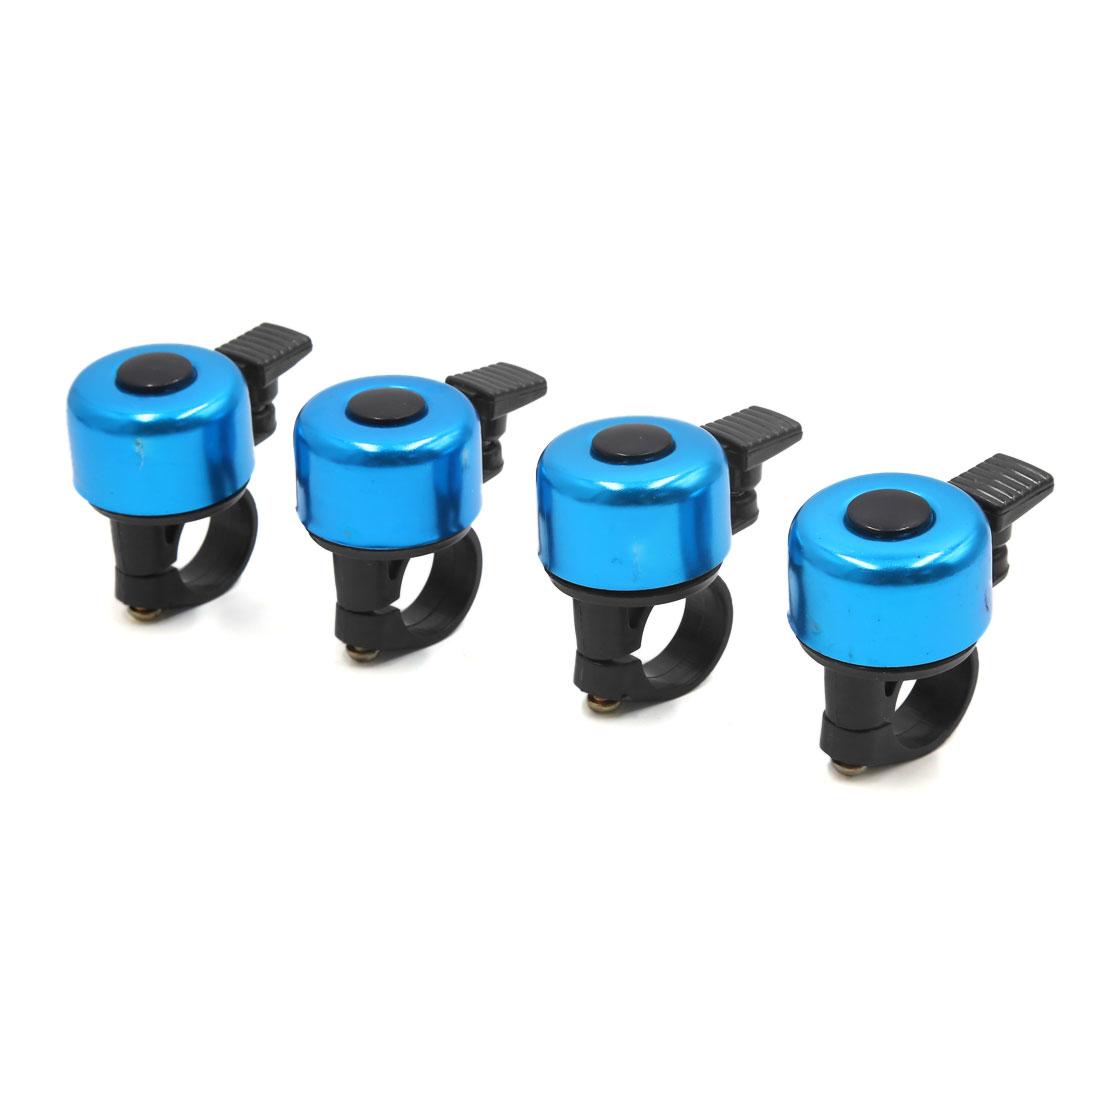 4 Pcs Blue Aluminum Alloy Bicycle Bike Cycling Handlebar Bell Ring Loud Horn